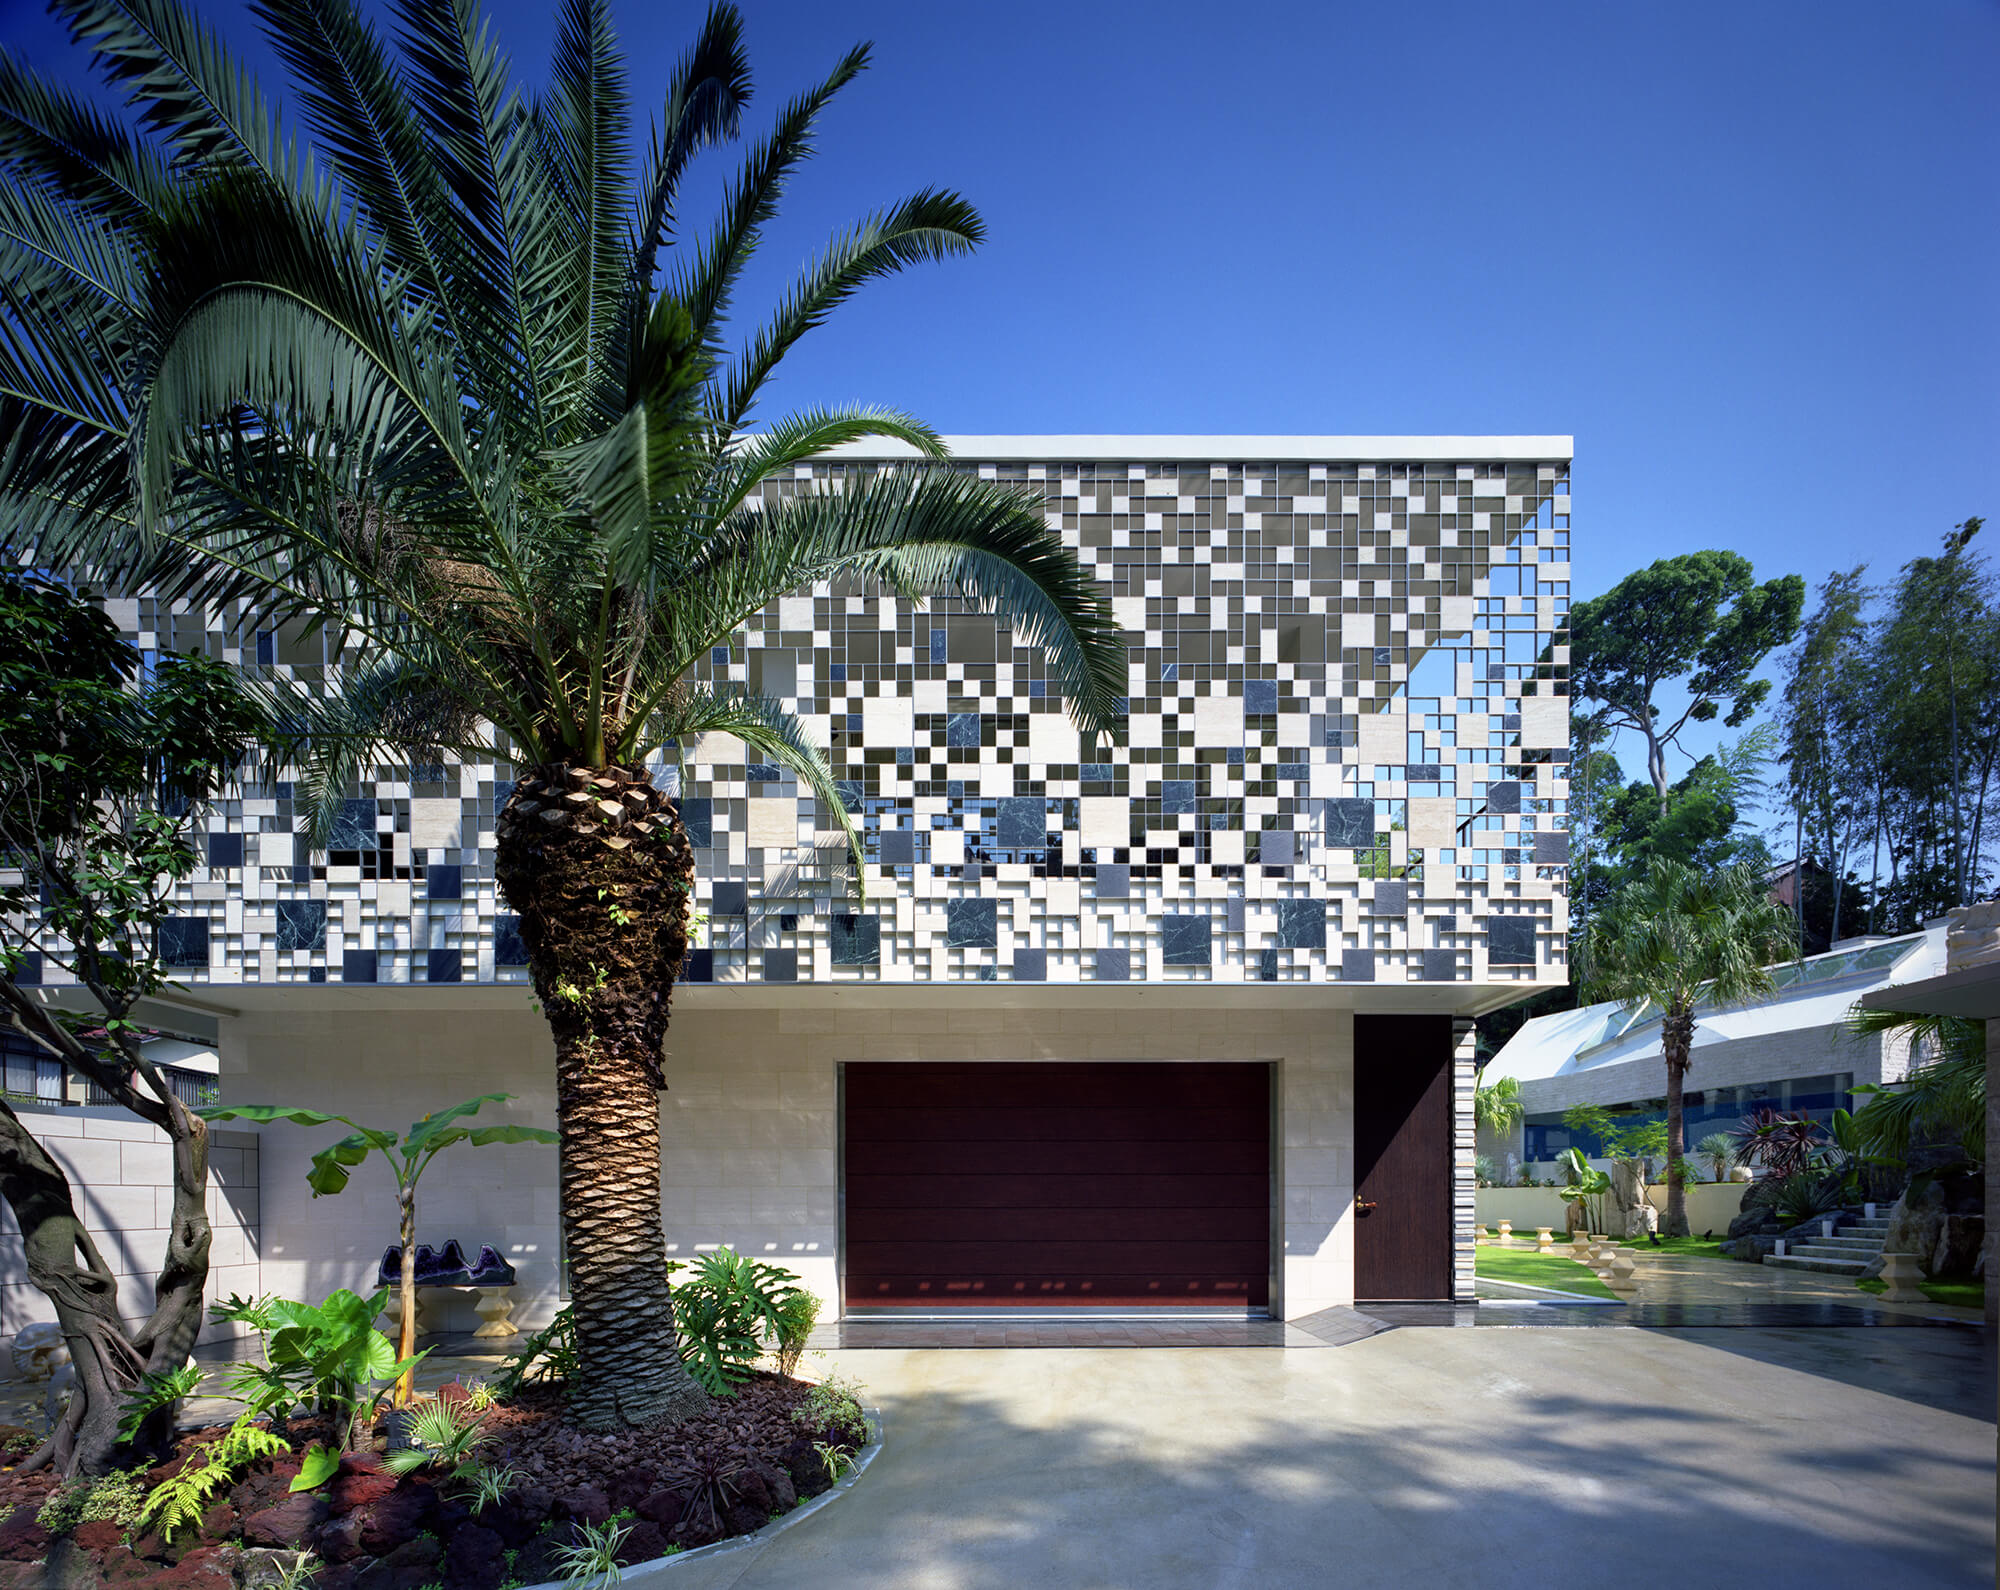 『桜坂の家』-福岡県福岡市-建築写真・竣工写真・インテリア写真1